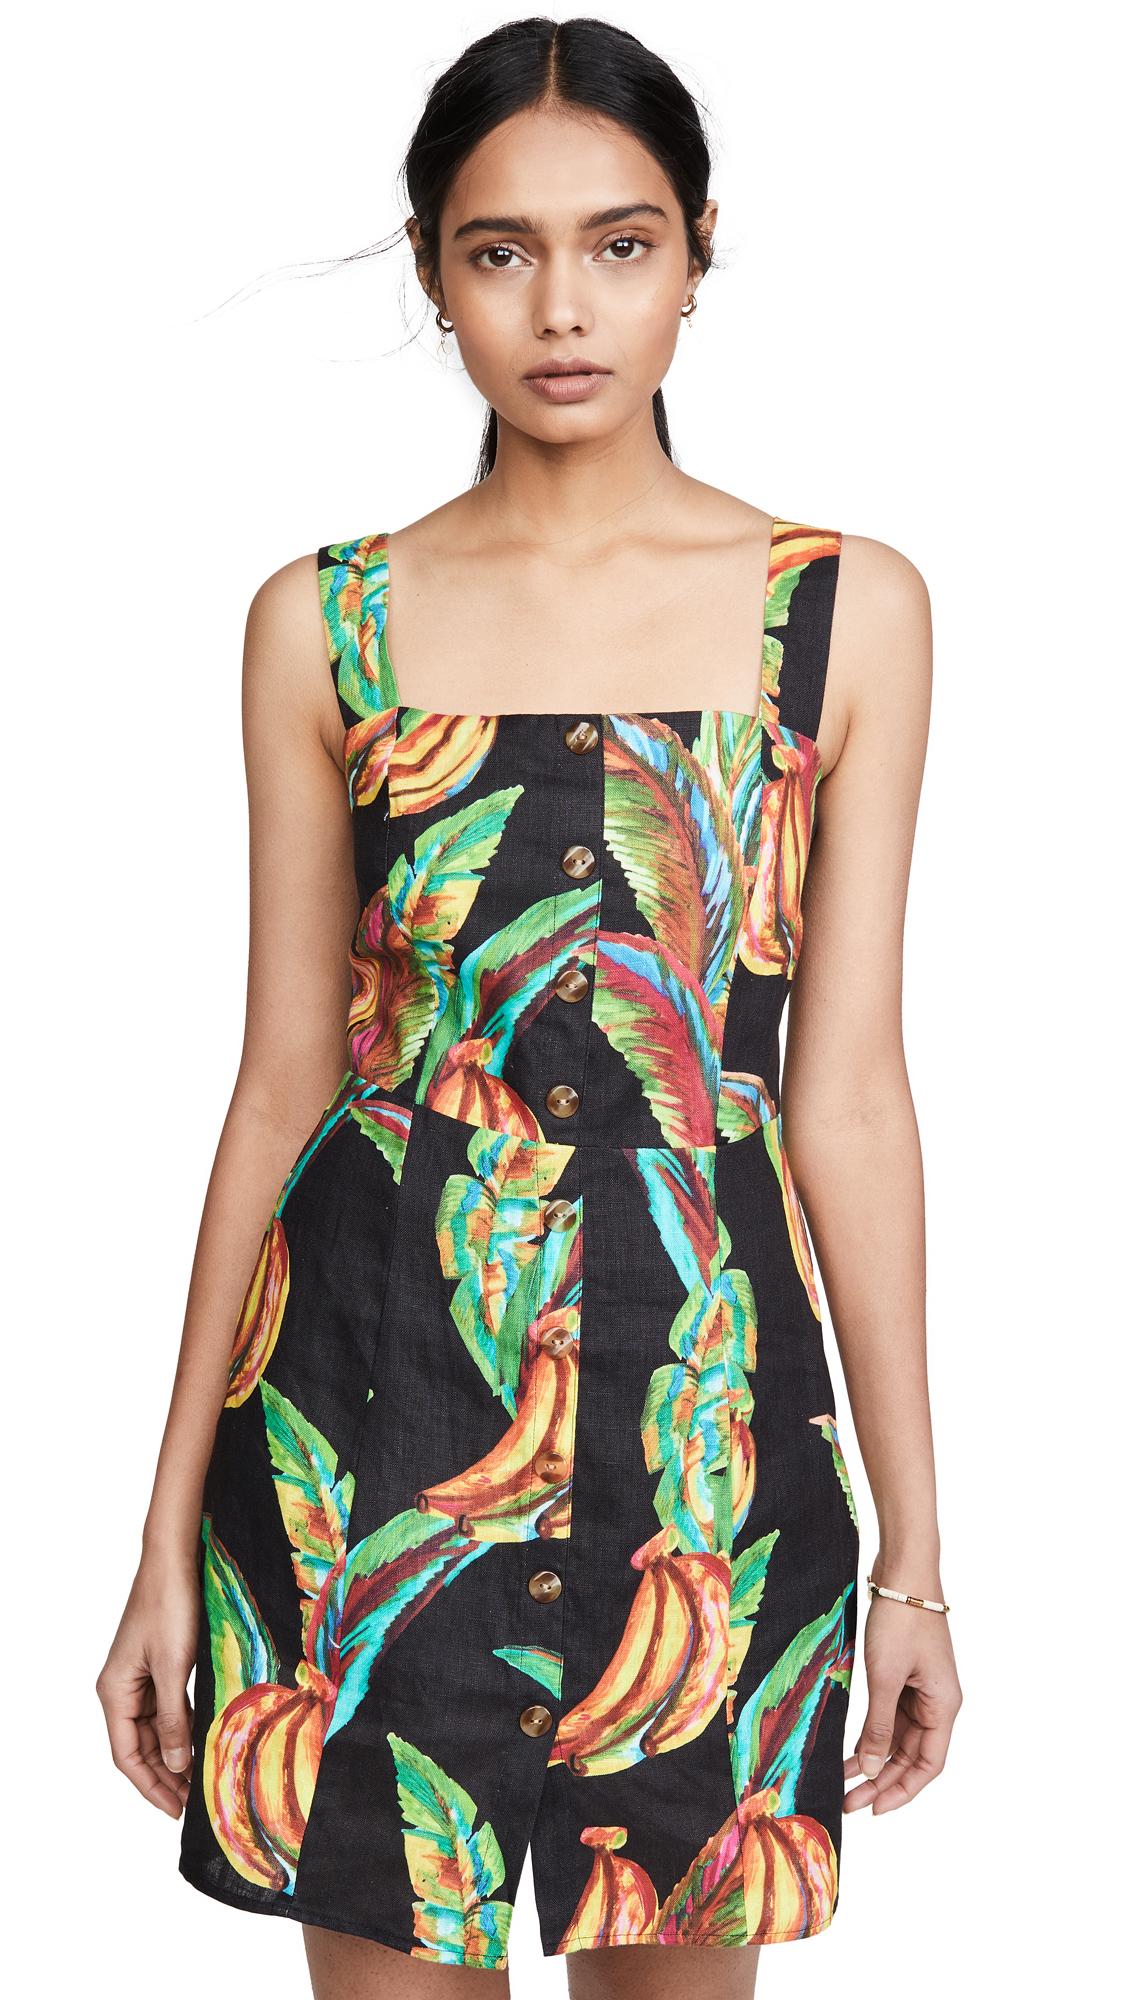 Photo of FARM Rio Preta Banana Linen Mini Dress - shop FARM Rio Clothing, Dresses online